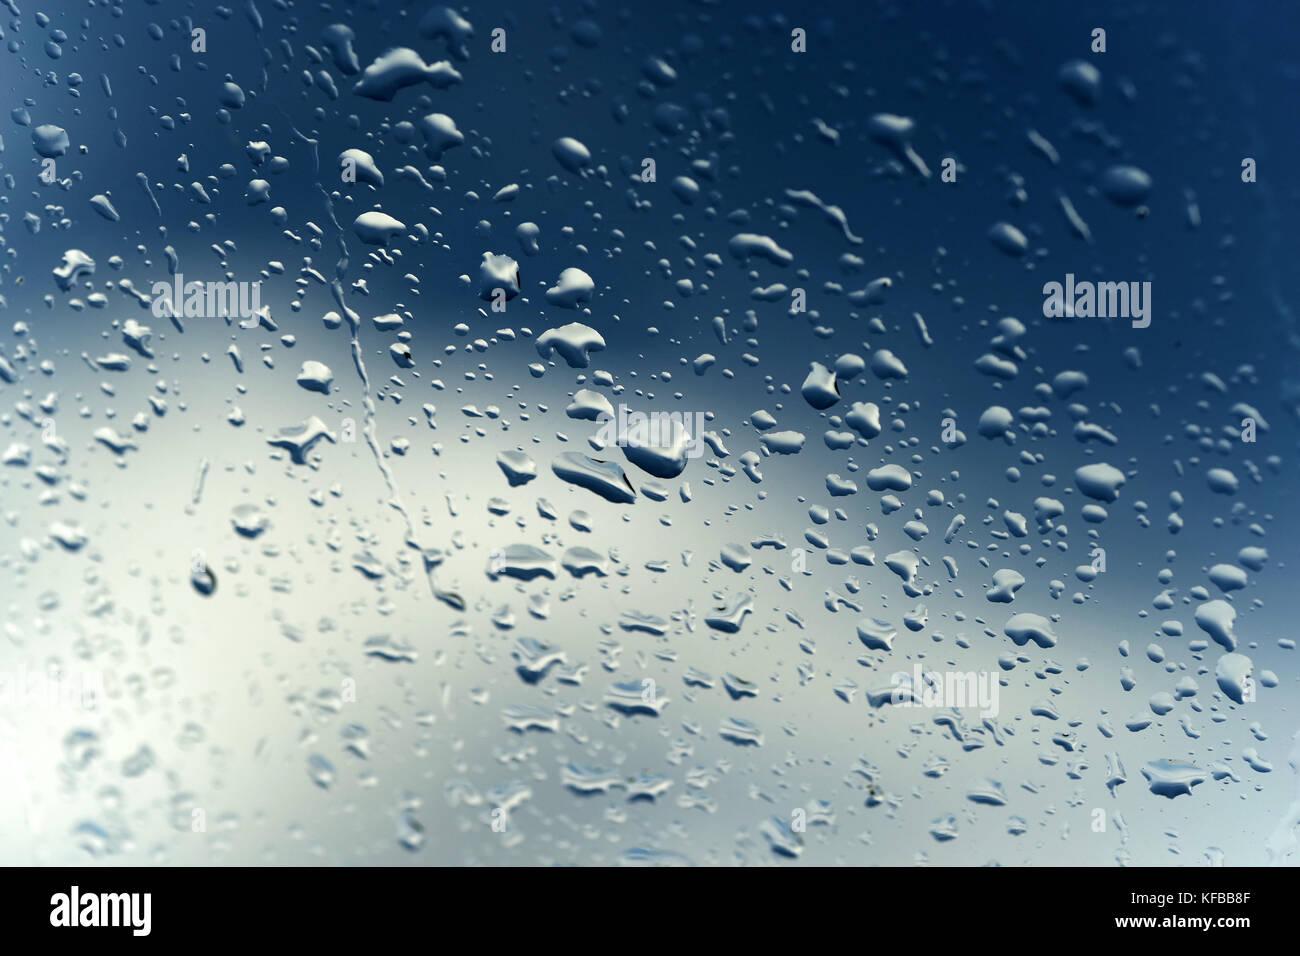 Rain water drops on windows glass - Stock Image